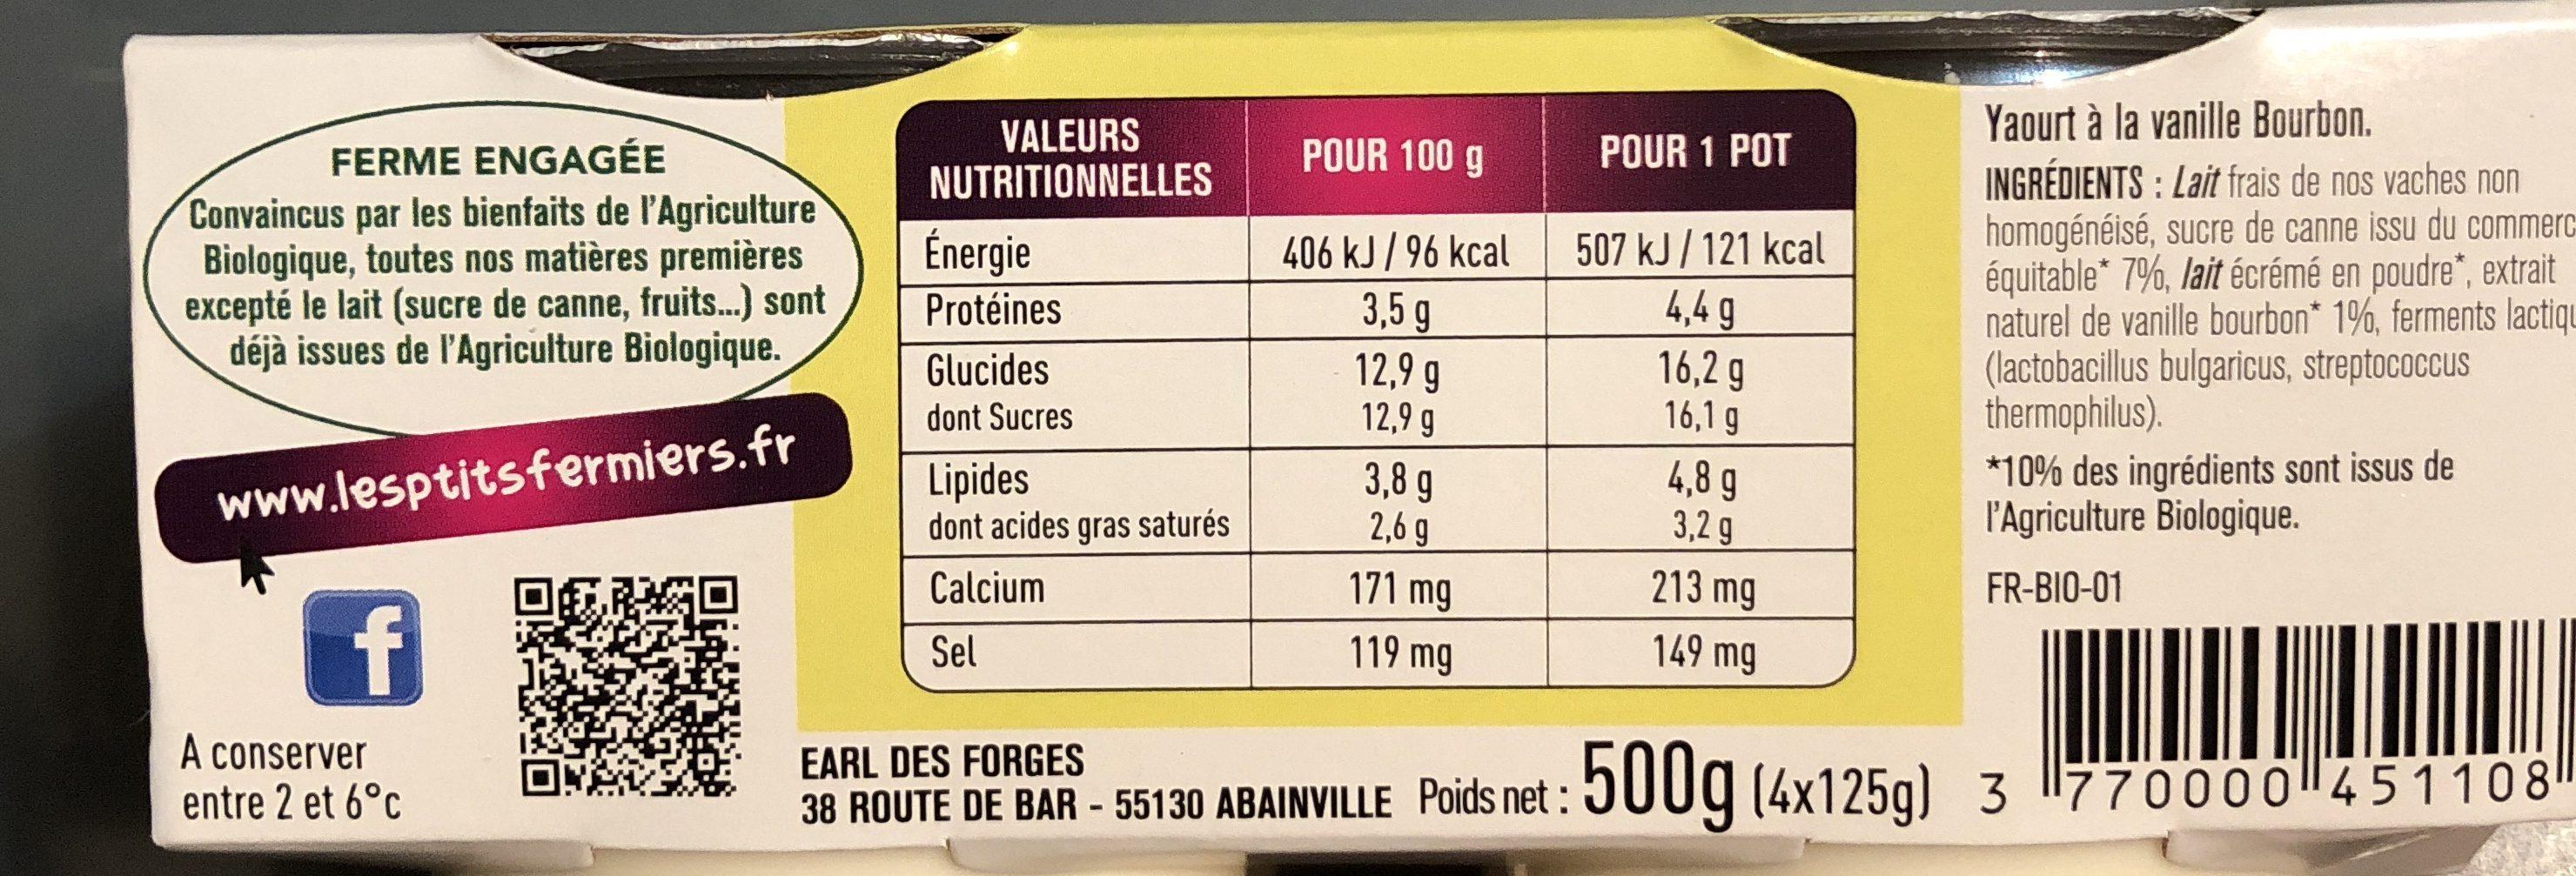 Yaourt fermier vanille bourbon - Ingrediënten